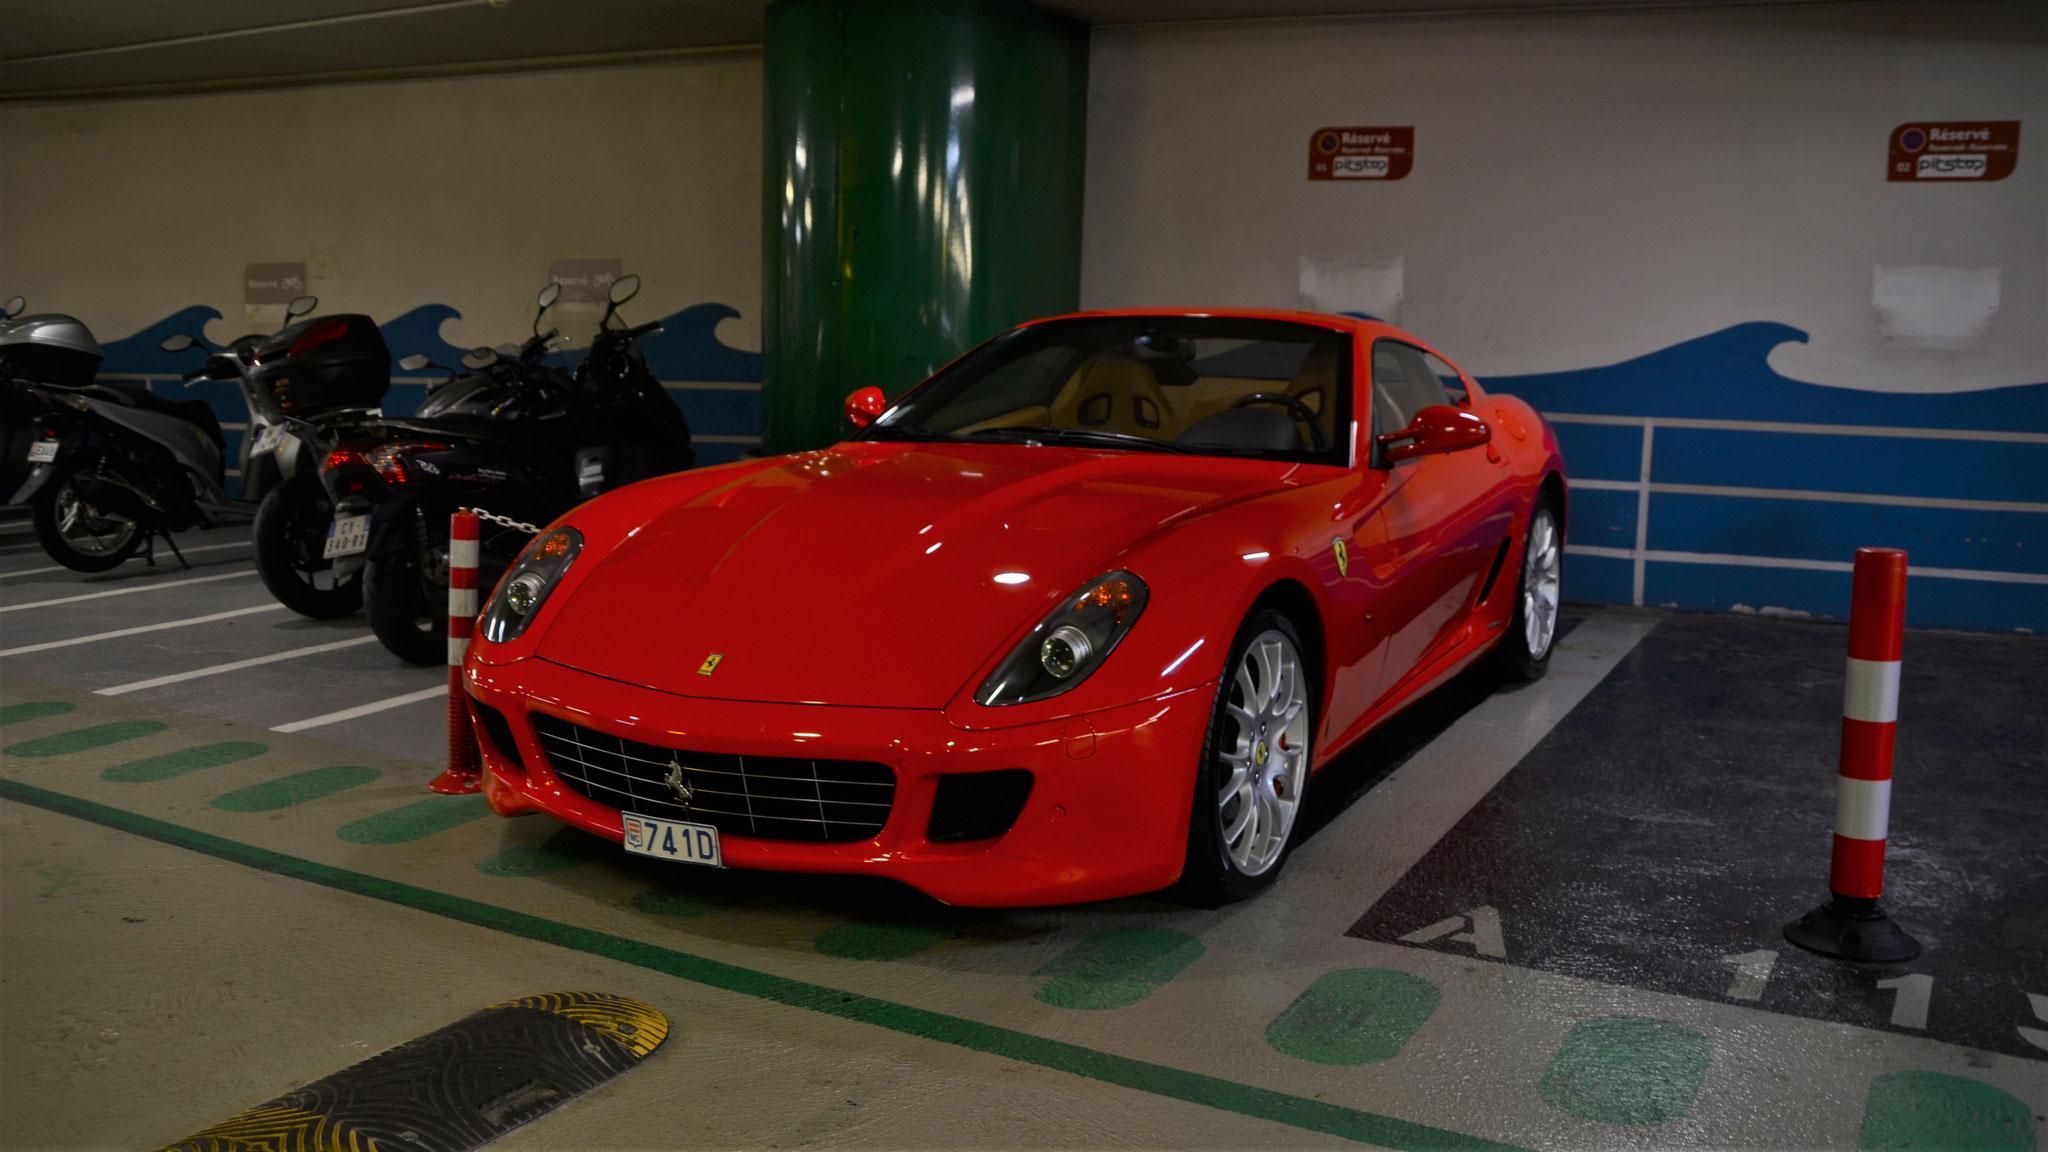 Ferrari 599 GTB - 741D (MC)